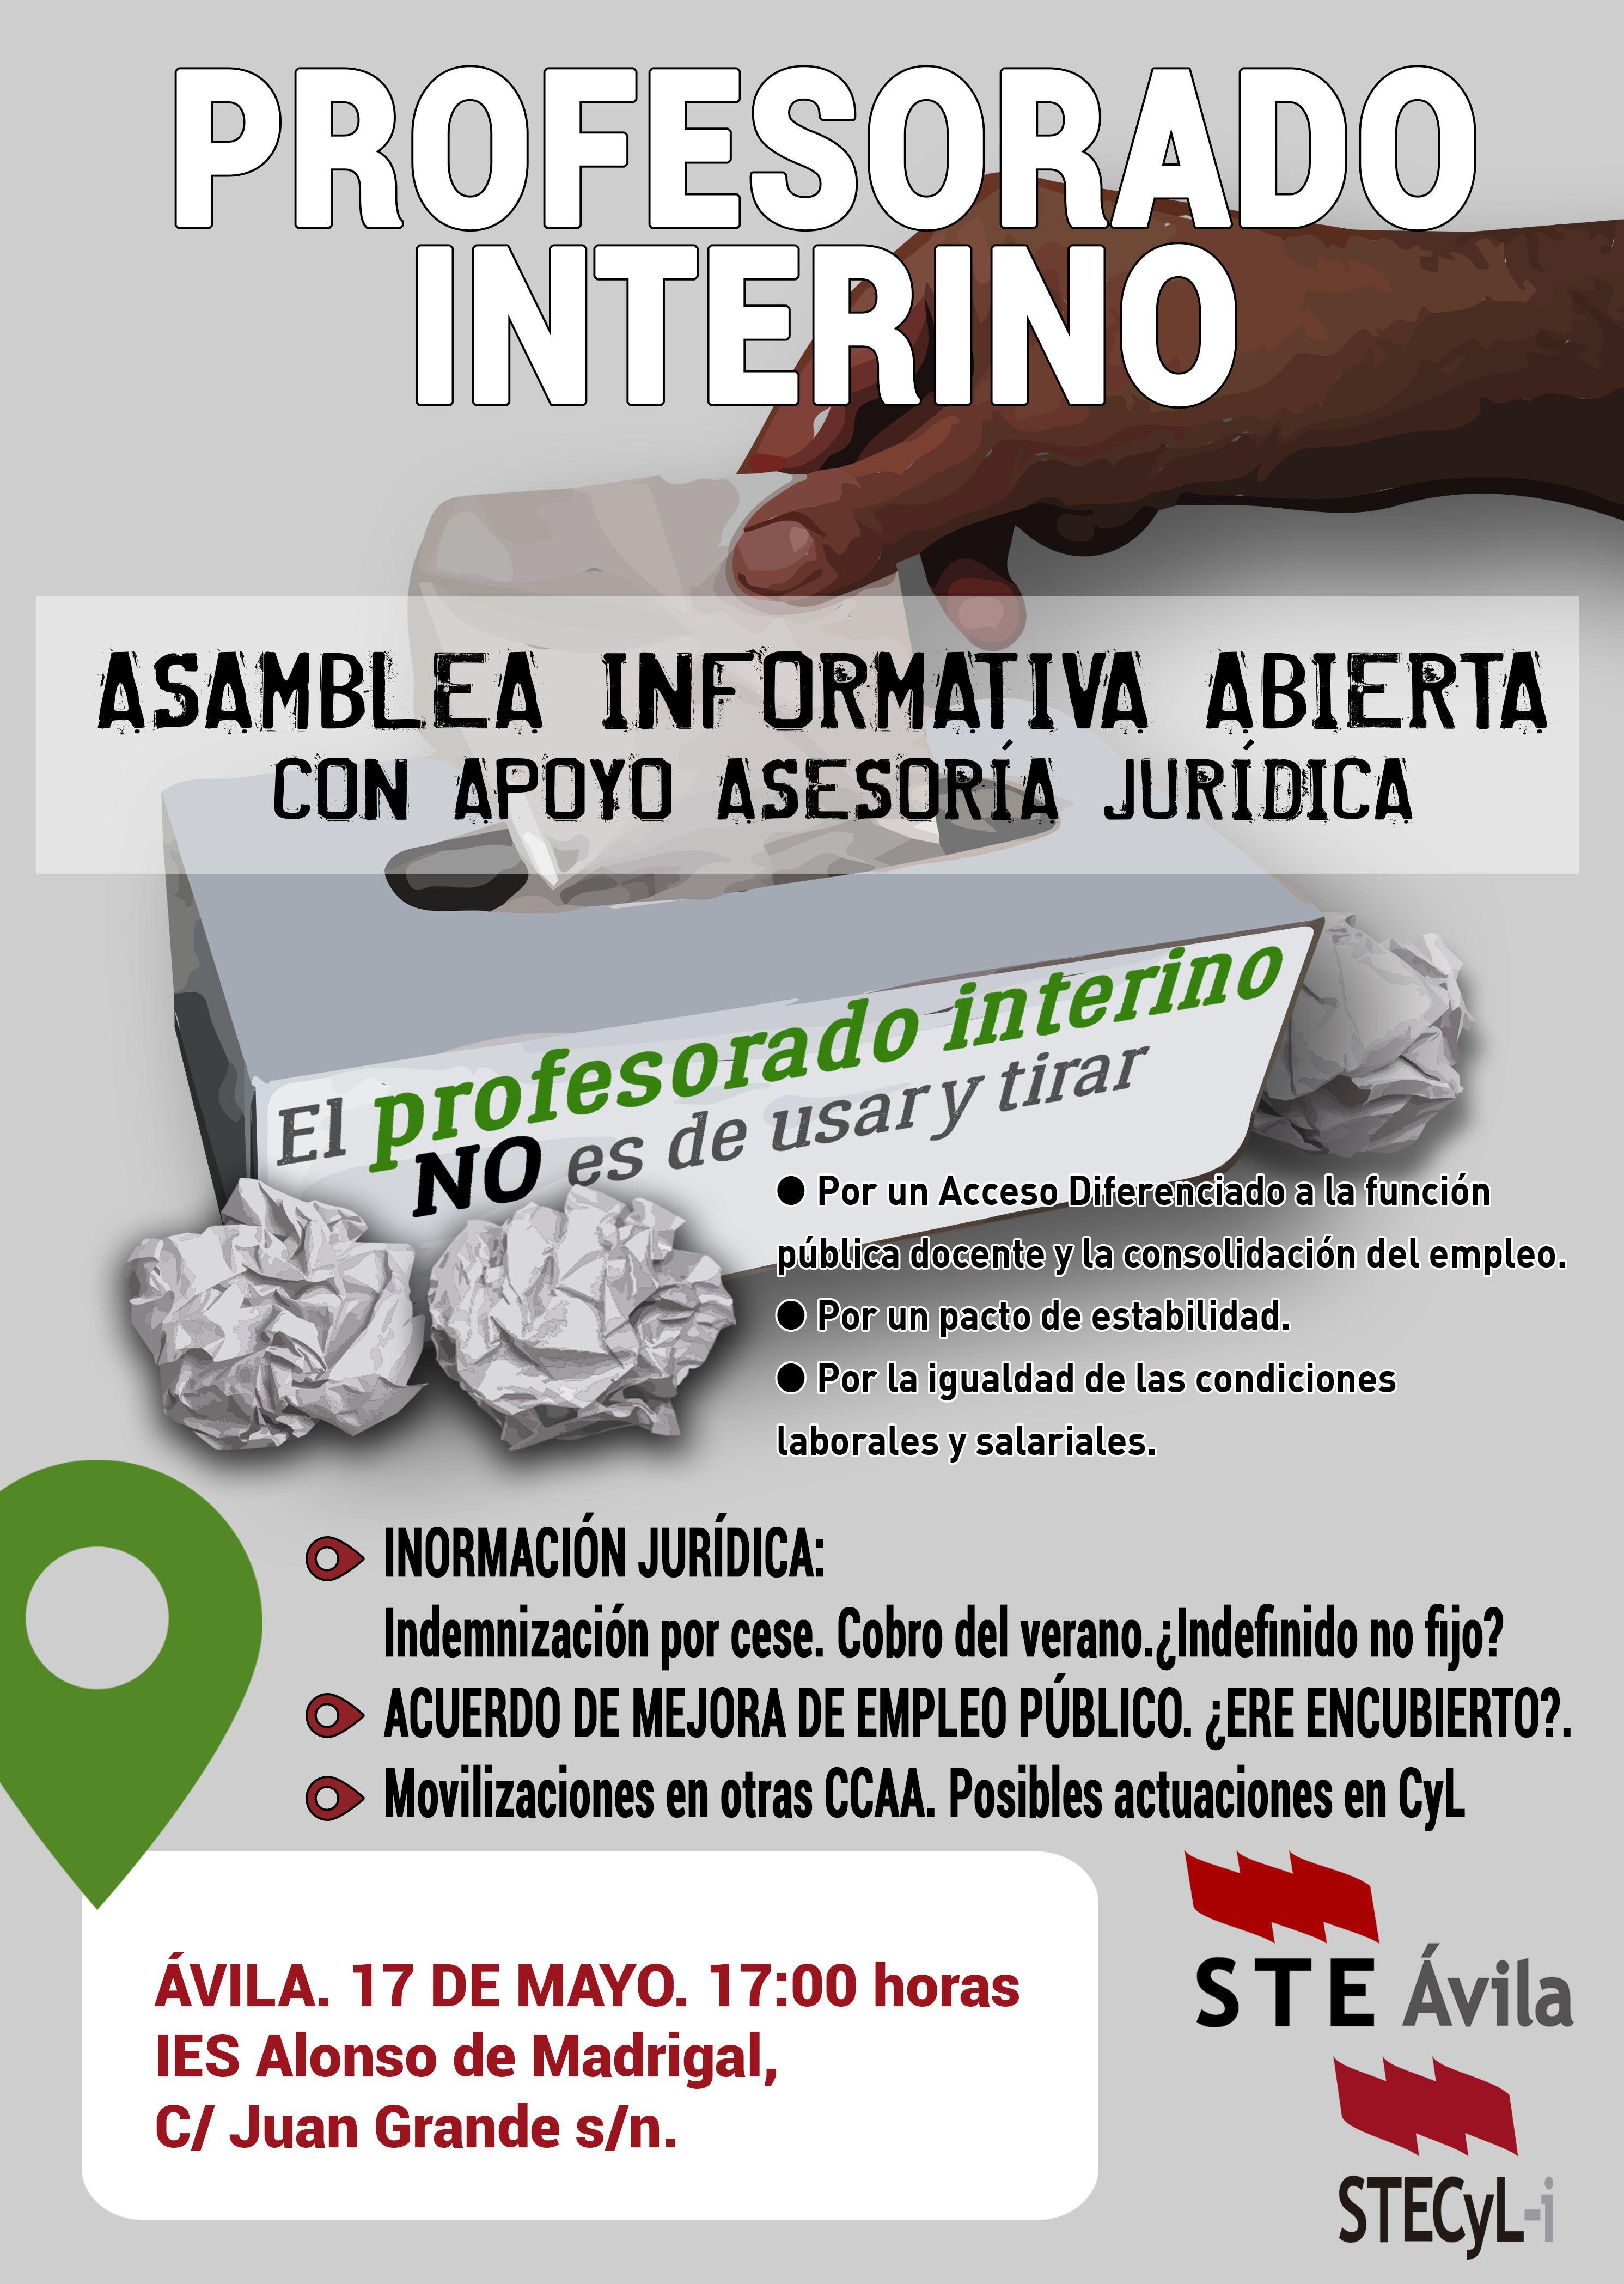 Cartel_ProfInterino_ASM INF_AVILA